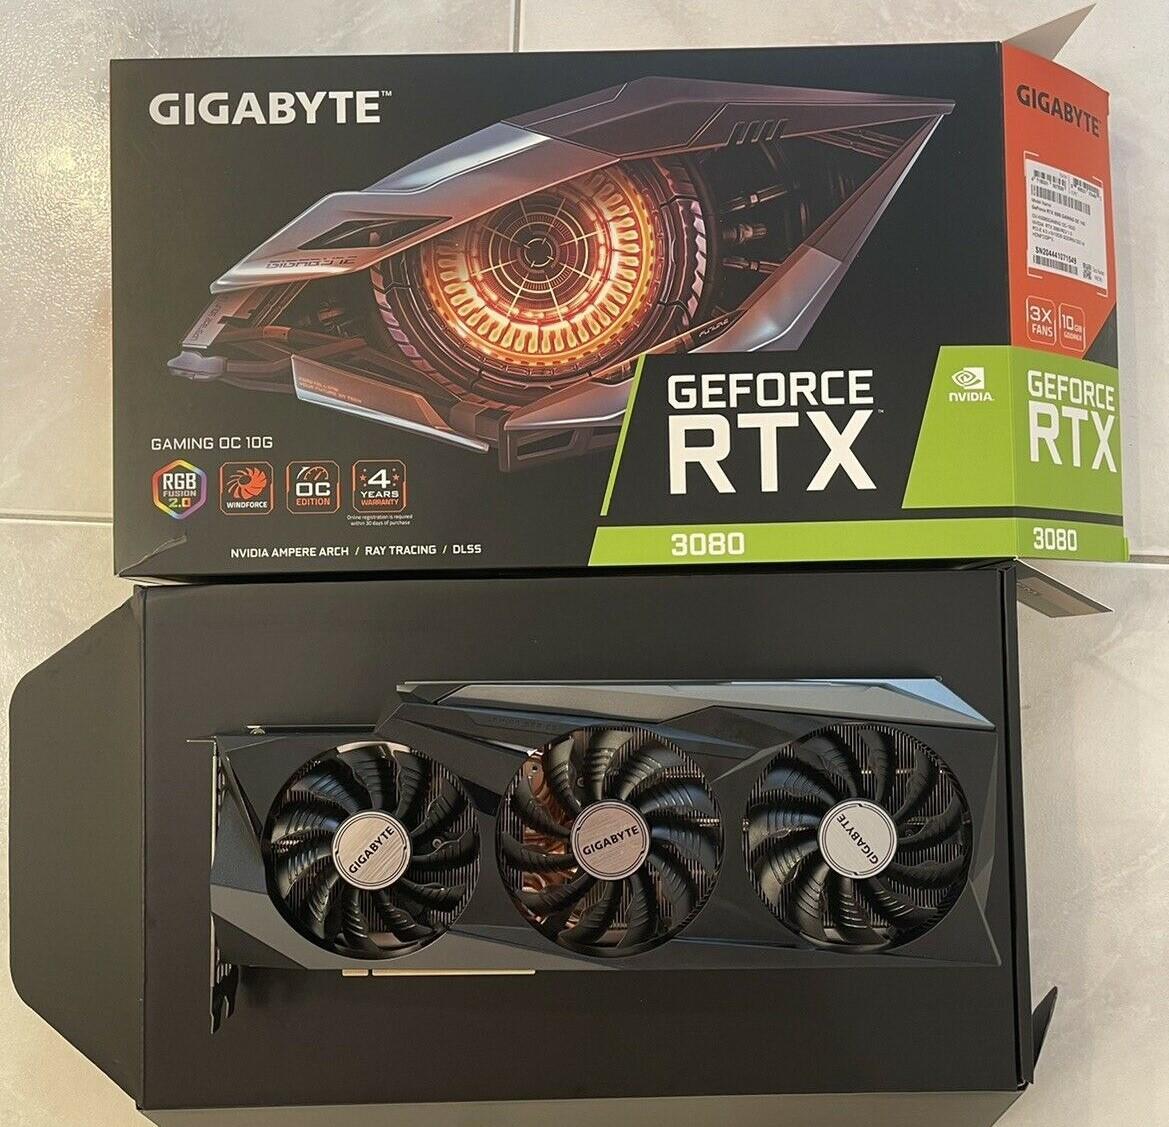 NVIDIA GEFORCE RTX 3090, RTX 3080, RTX 3080 TI, RTX 3070 TI, RTX 3070, RTX 3060 TI, RTX 3060, RADEON RX 6900 XT , RADEON RX 6800 XT